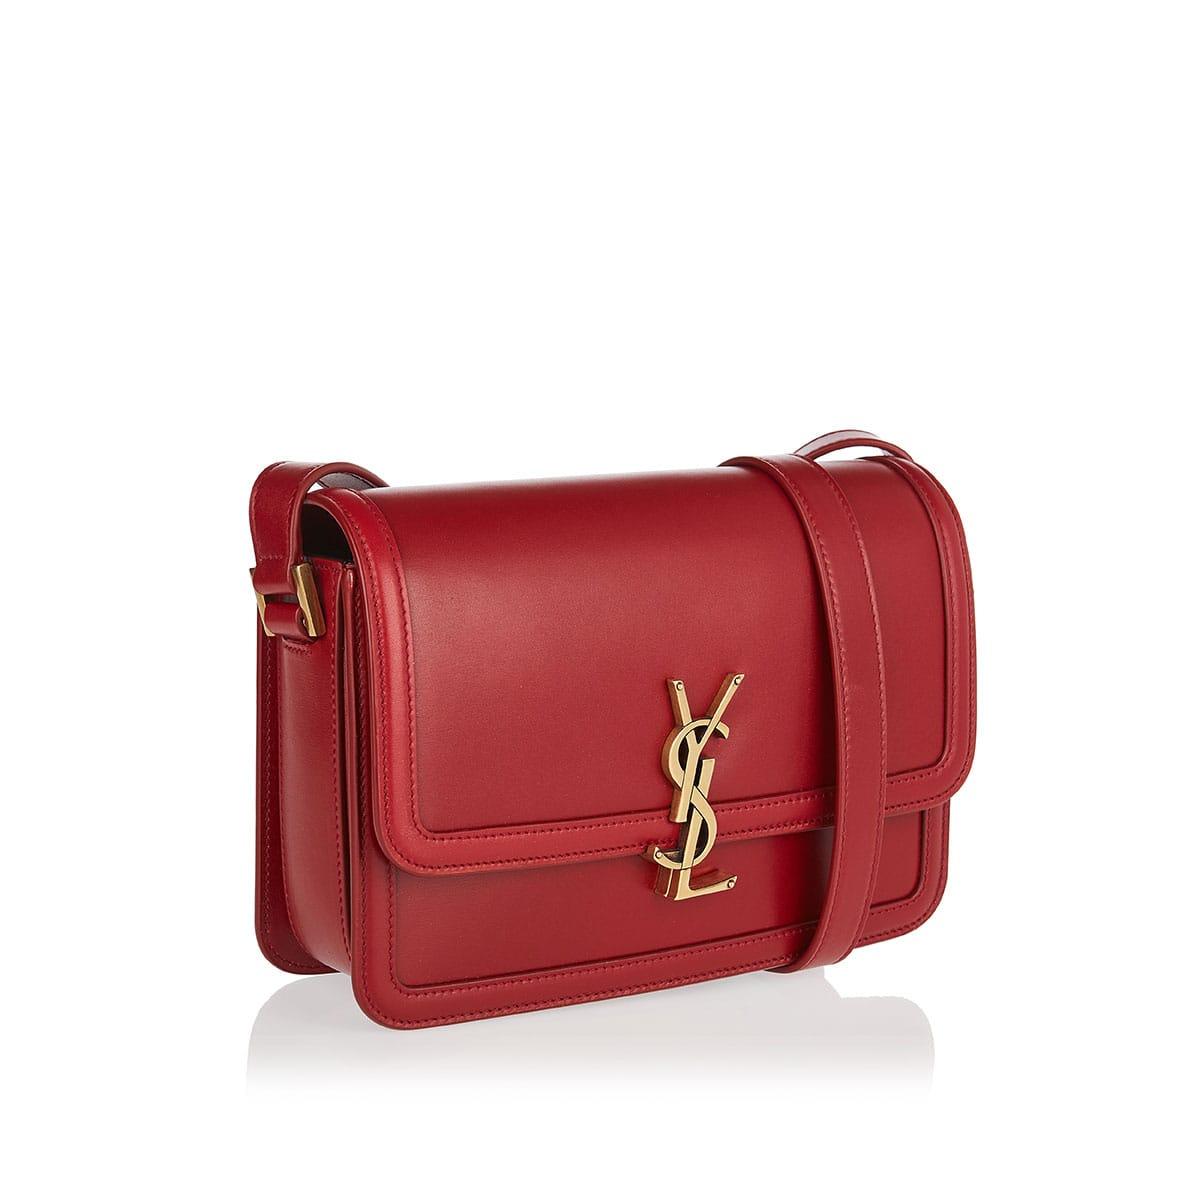 Solferino leather satchel bag